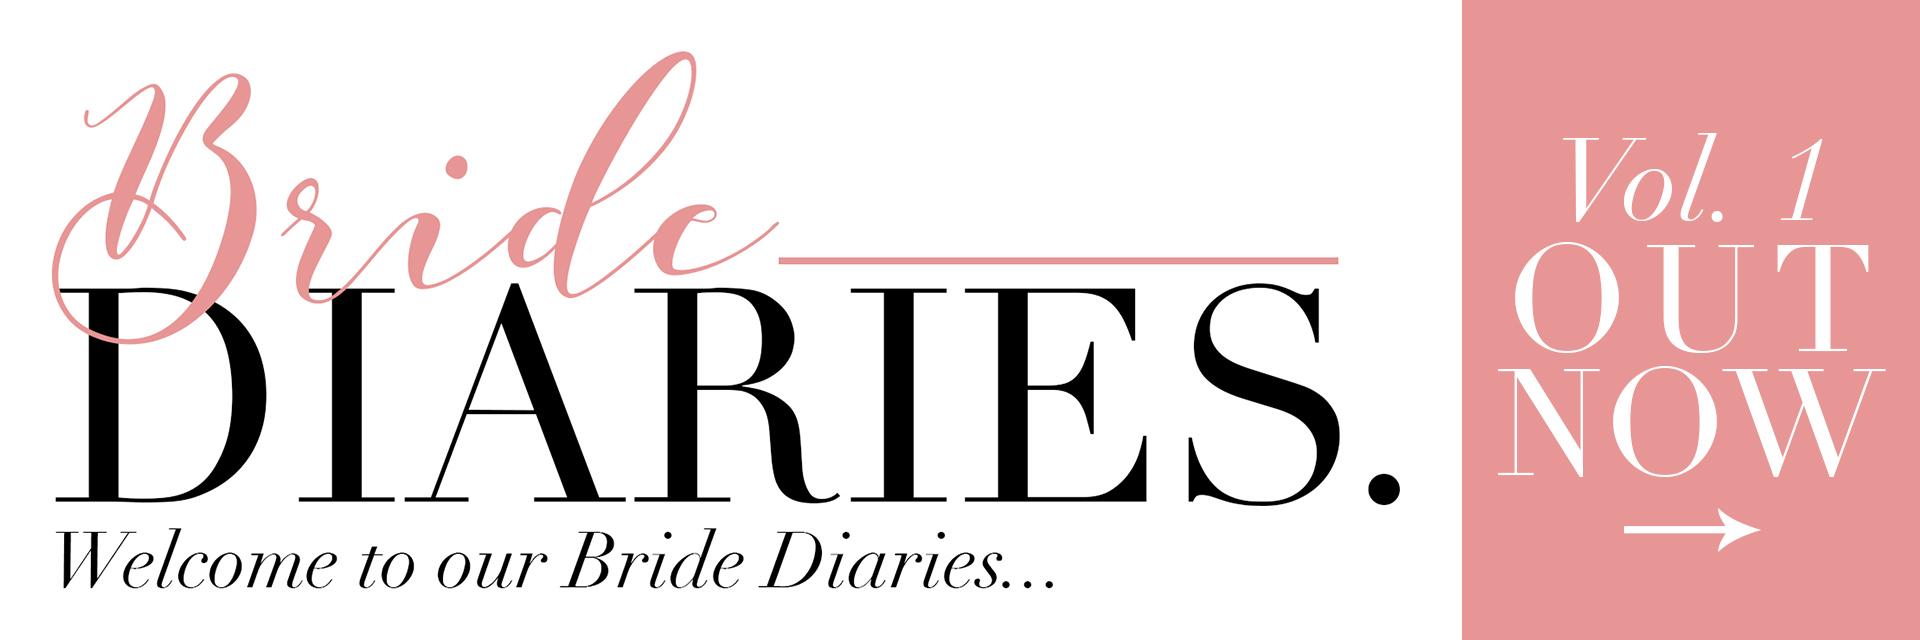 Bride Diaries